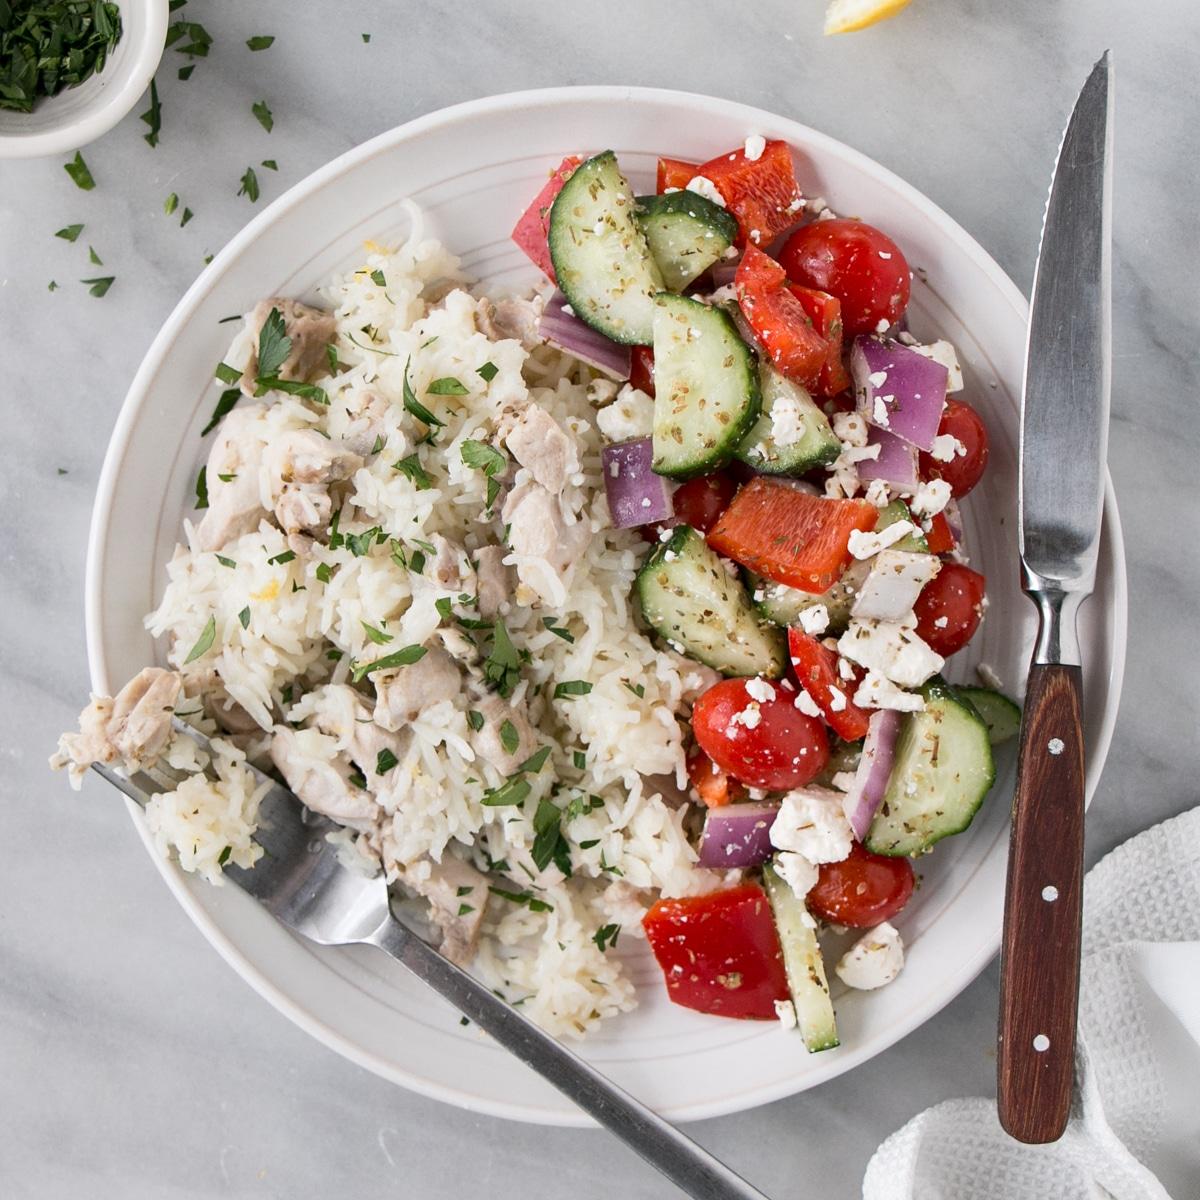 65 Easy Instant Pot + Crockpot Dinner Recipes | Greek Instant Pot Chicken and Rice recipe